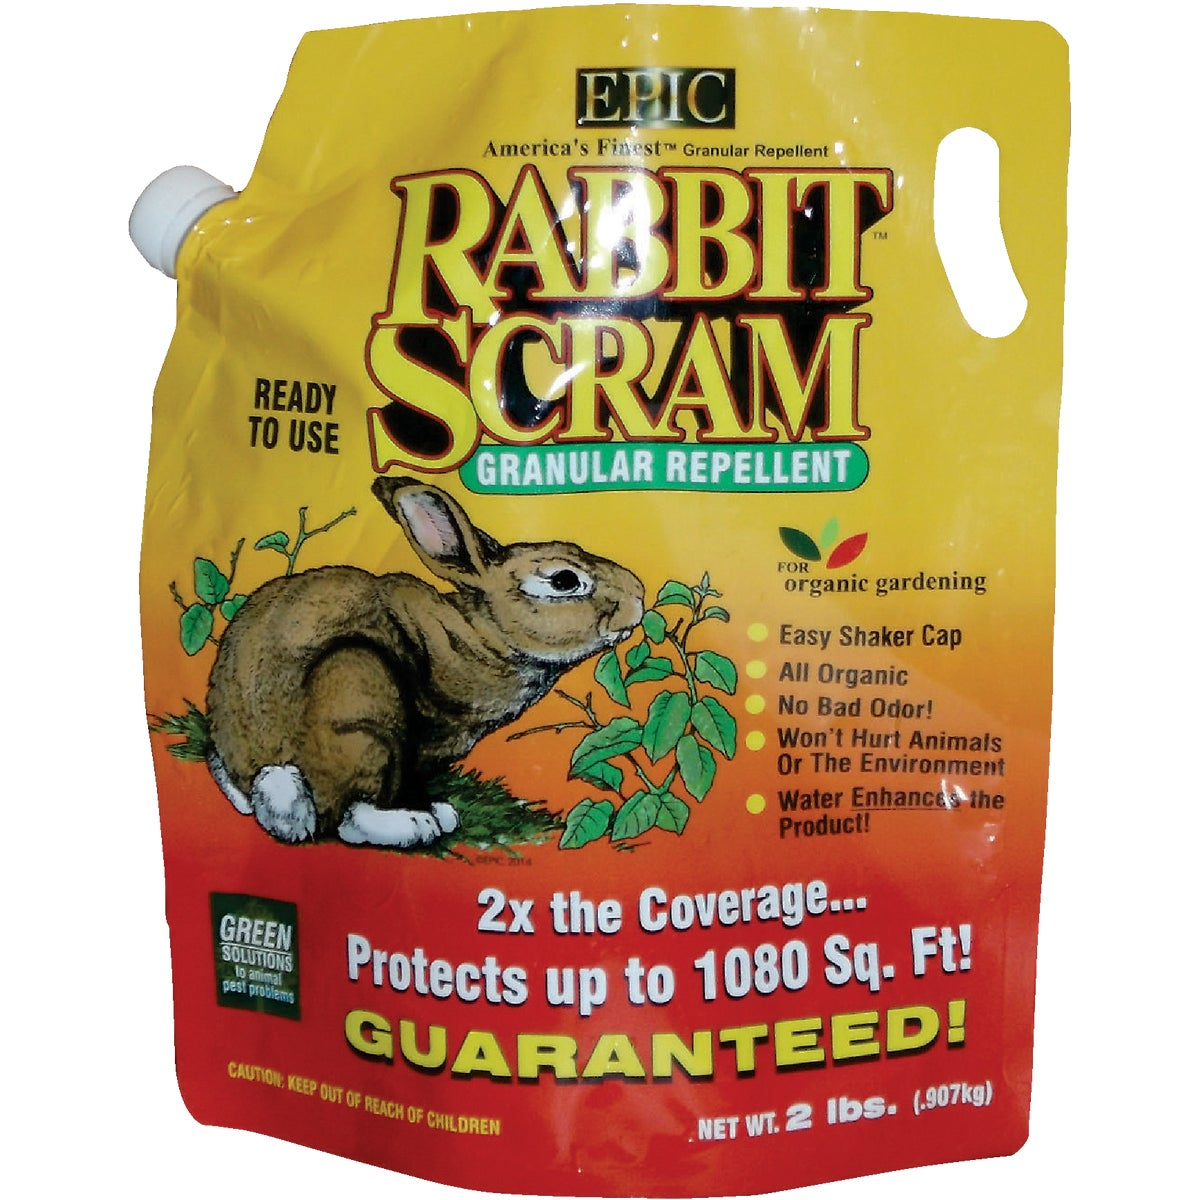 Enviro Pro 11003 Rabbit Scram Repellent Granular Shaker Can, 2.5 Pounds